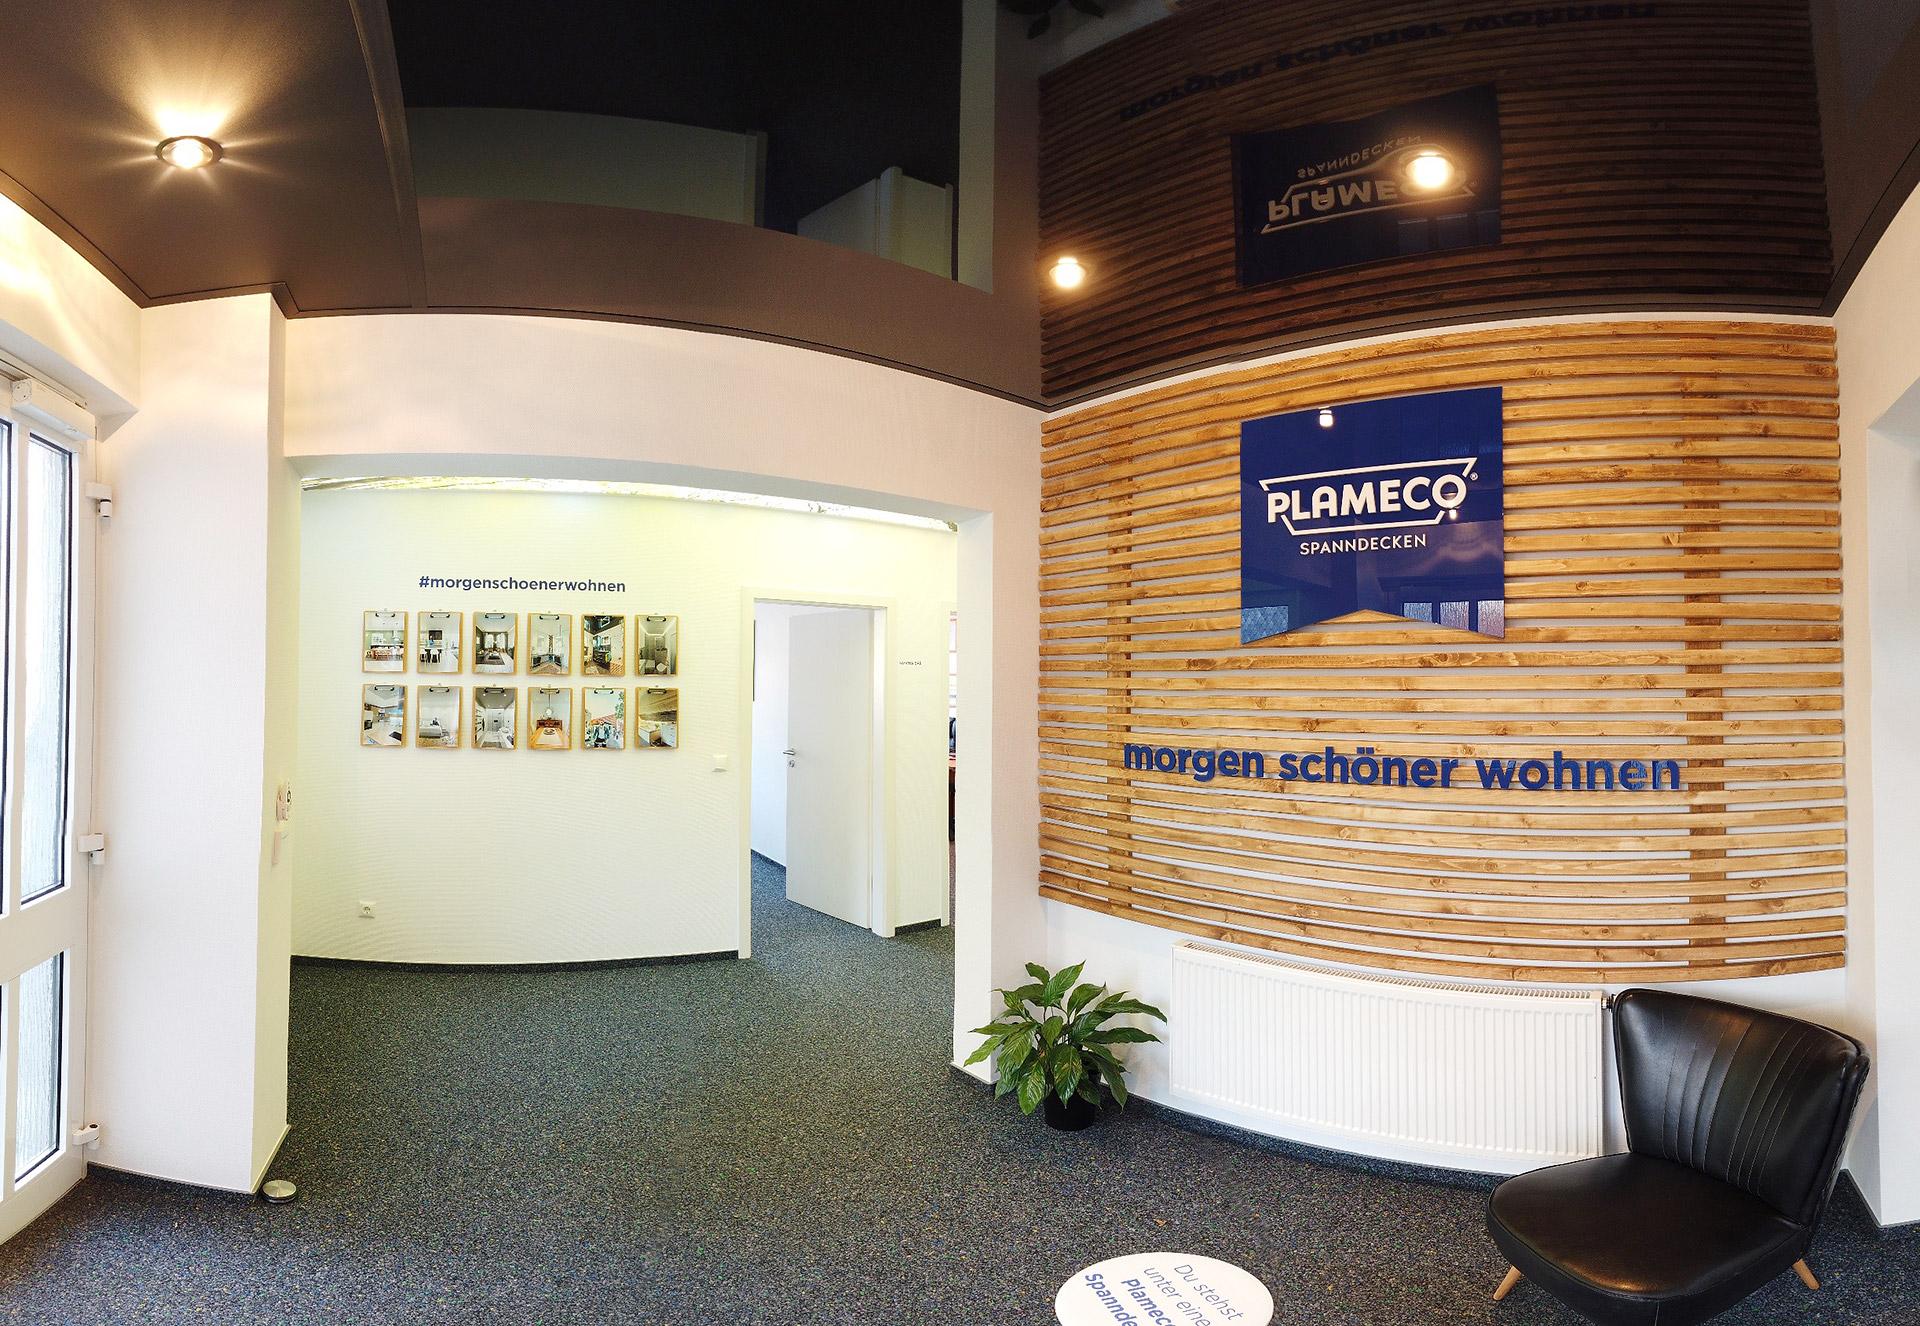 Plameco Spanndecken Virtuelle Ausstellung Lackdecke